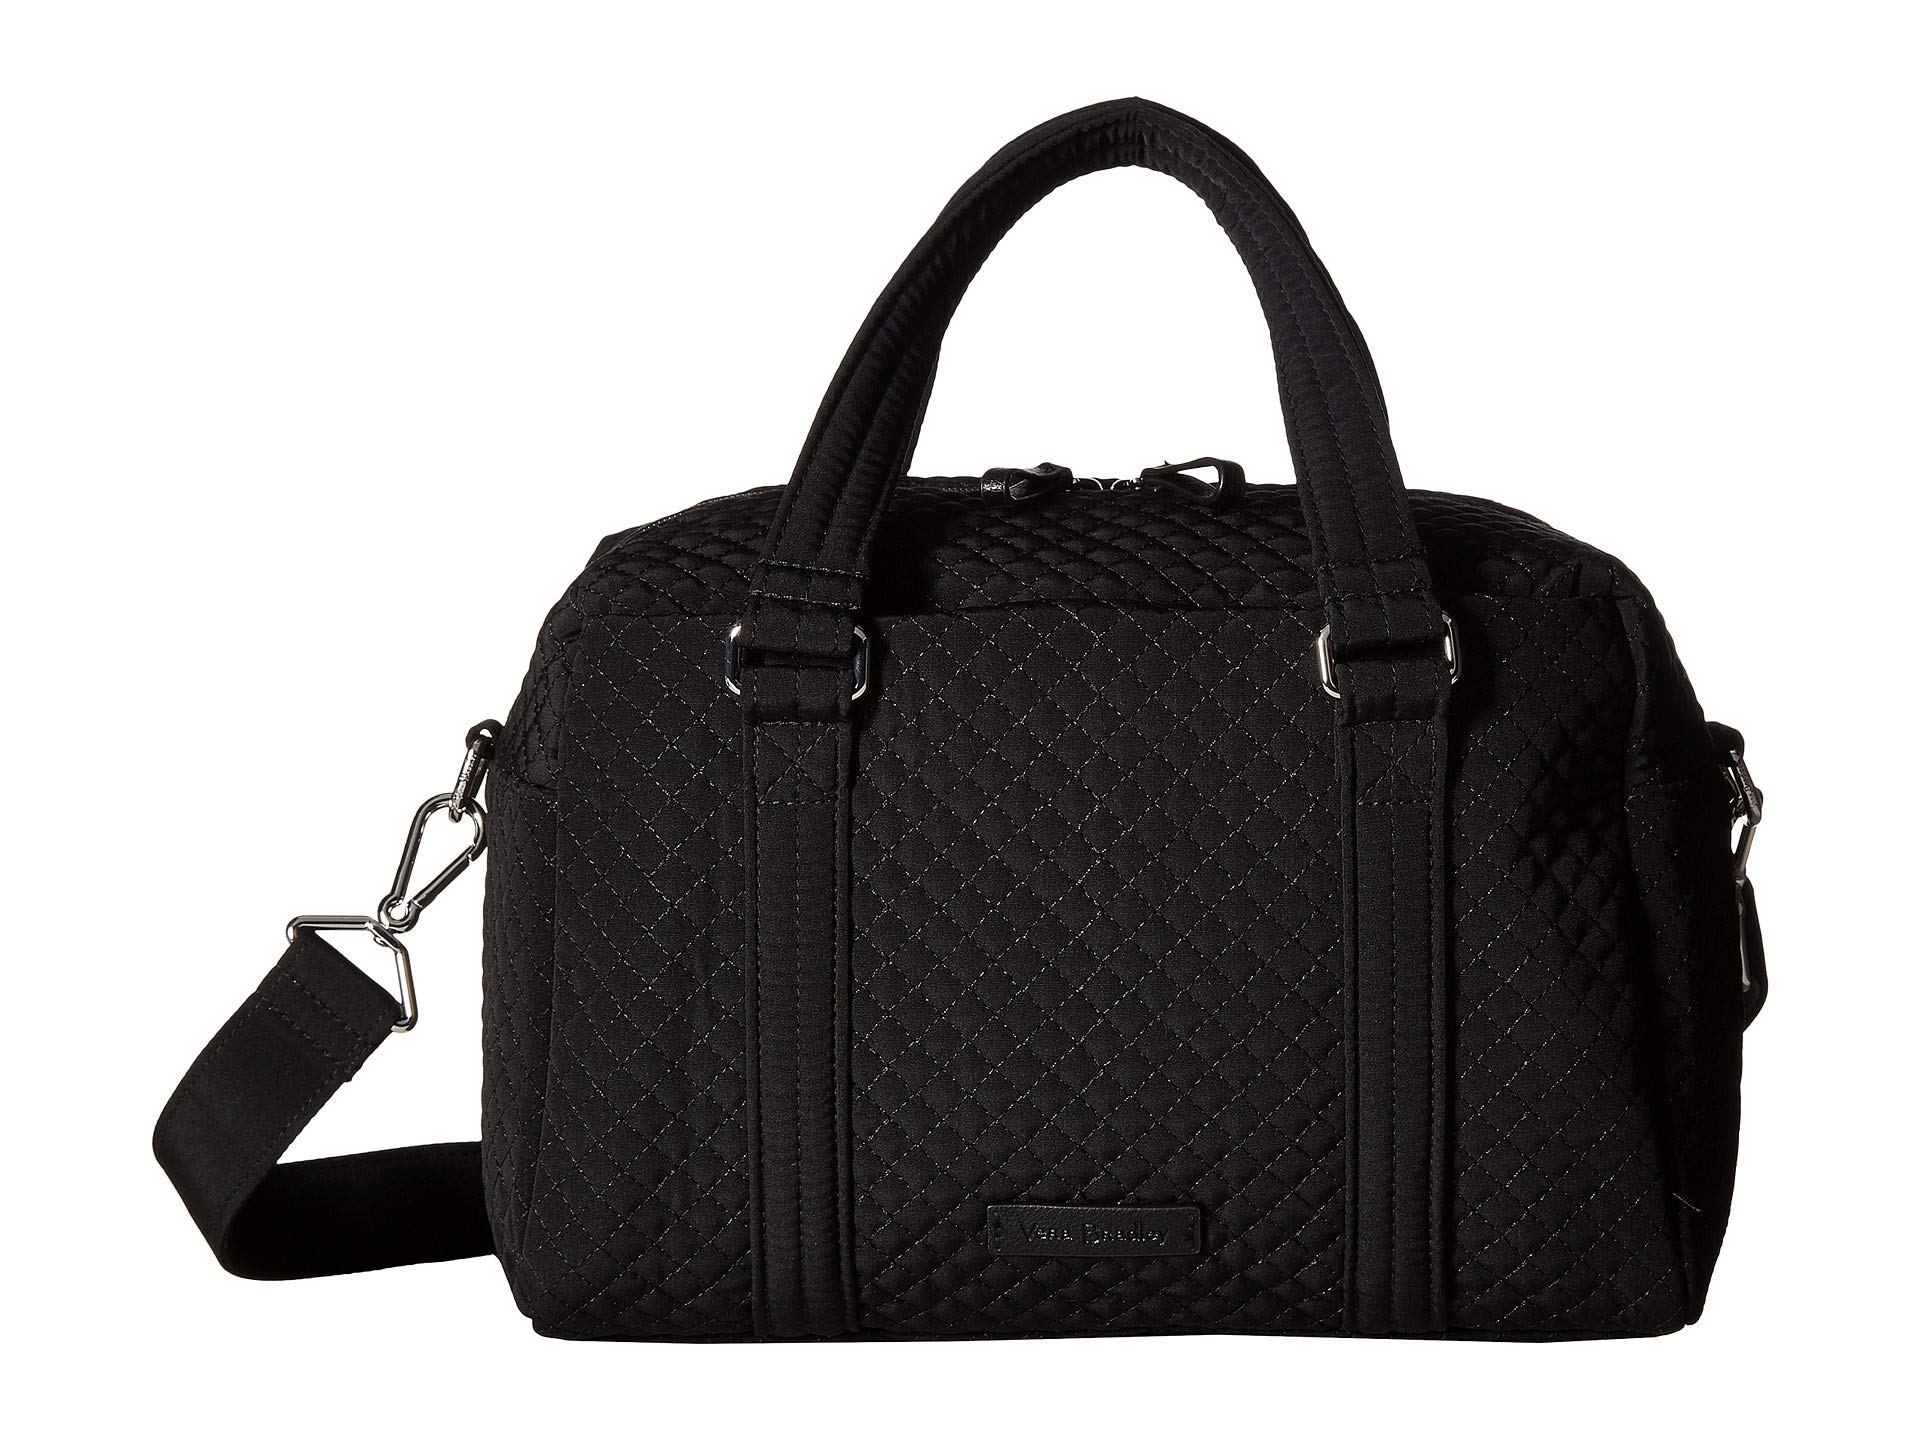 100 Black Classic Handbag Vera Iconic Bradley xqnBYwPFw